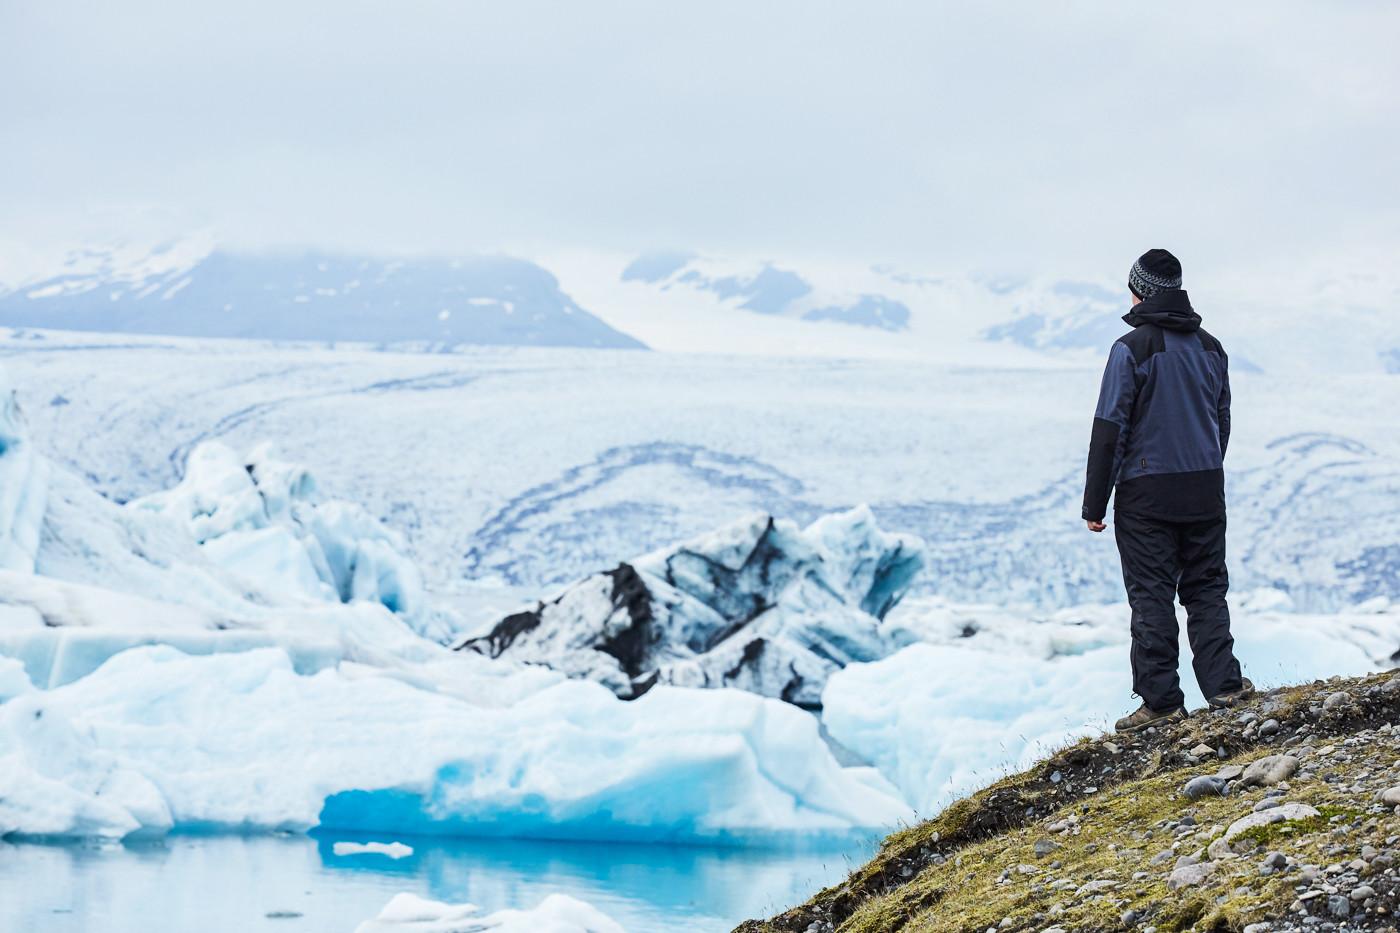 Jökulsárlón, Eissee, Gletschersee, Ice Lagoon, Lagoon, Iceland, Island, Reiseblog, Travelblog, Ronnie, Miles and Shores